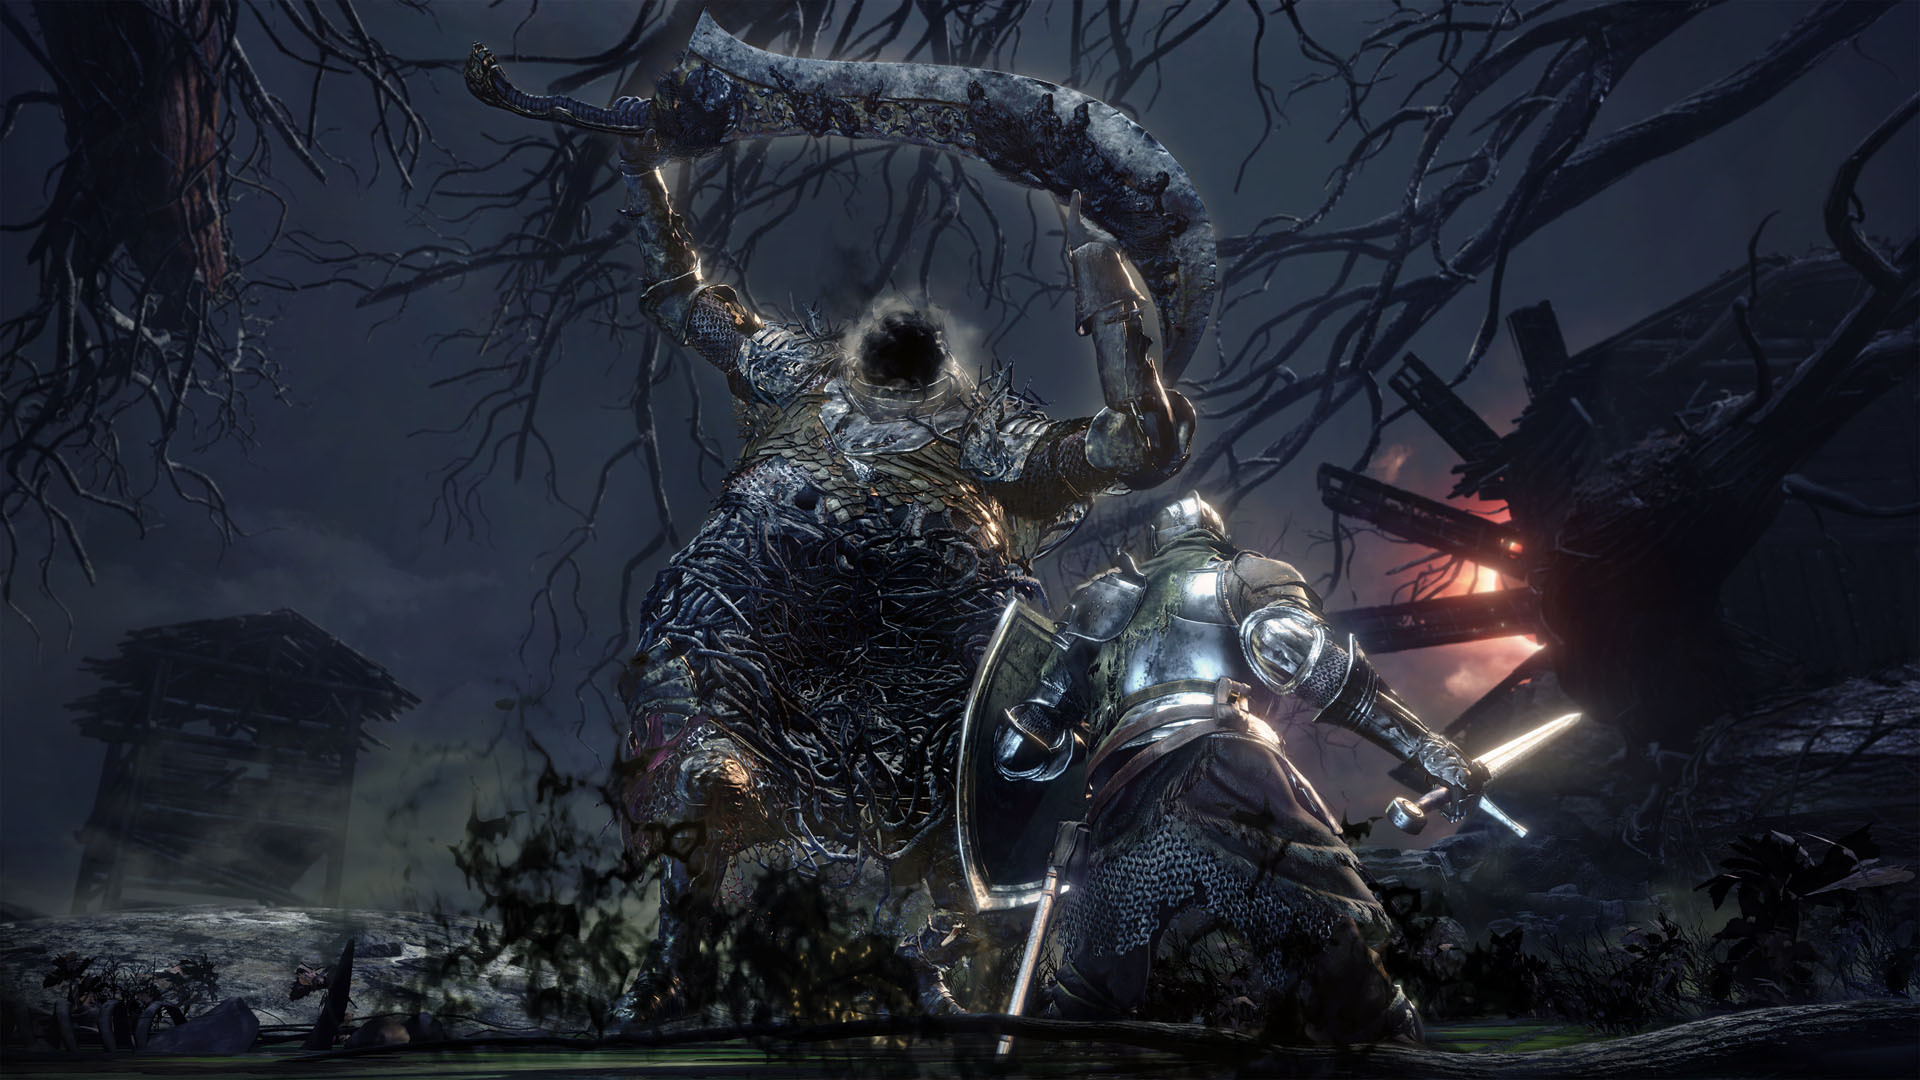 Dark Souls 3: The Ringed City image